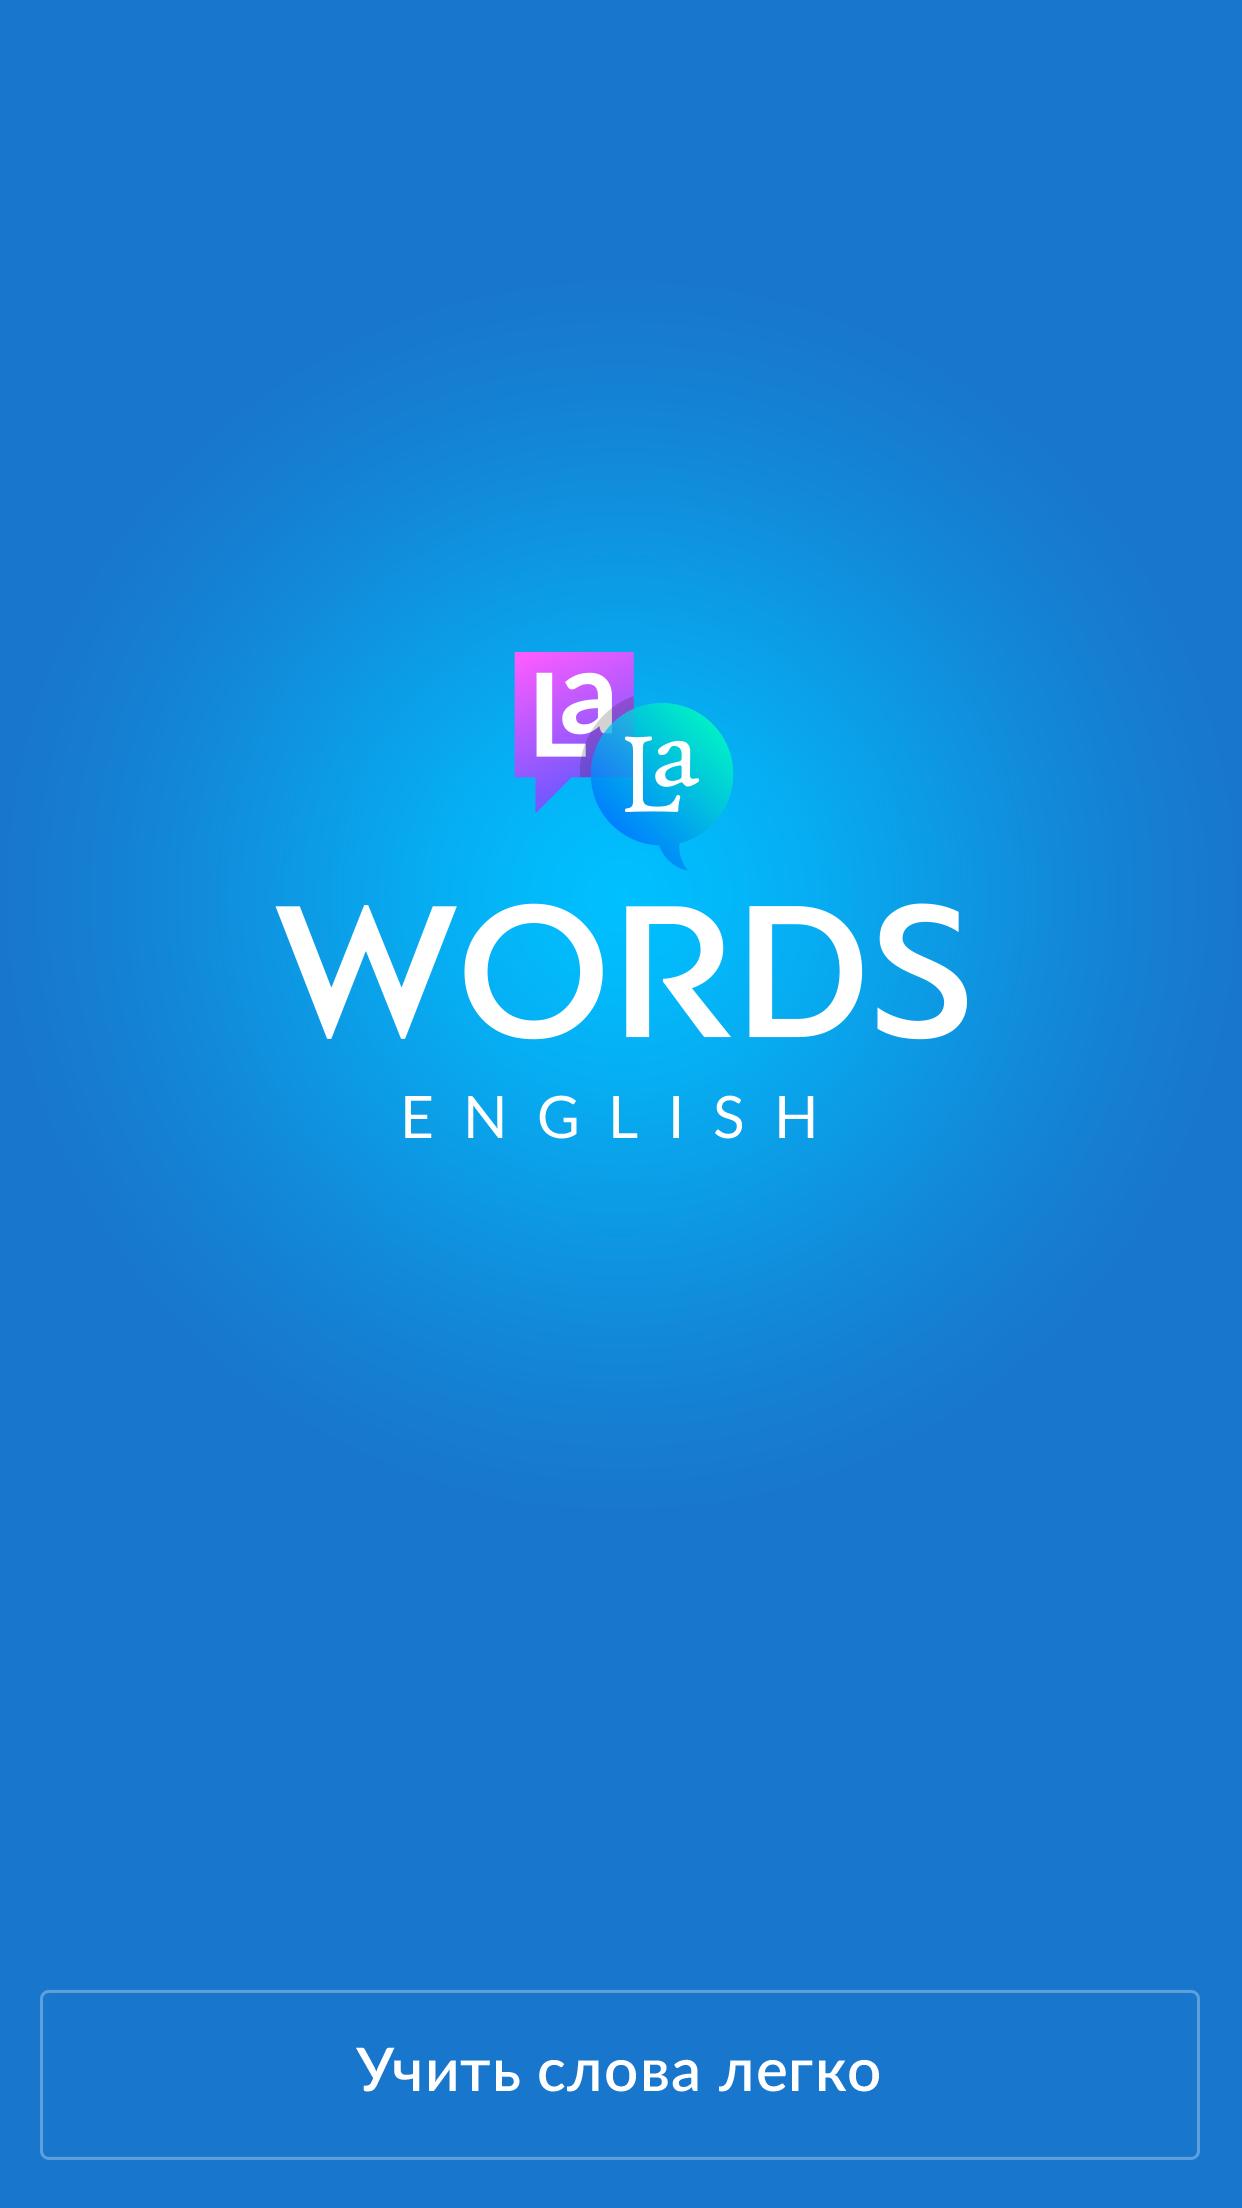 LaLaWords - запоминание слов